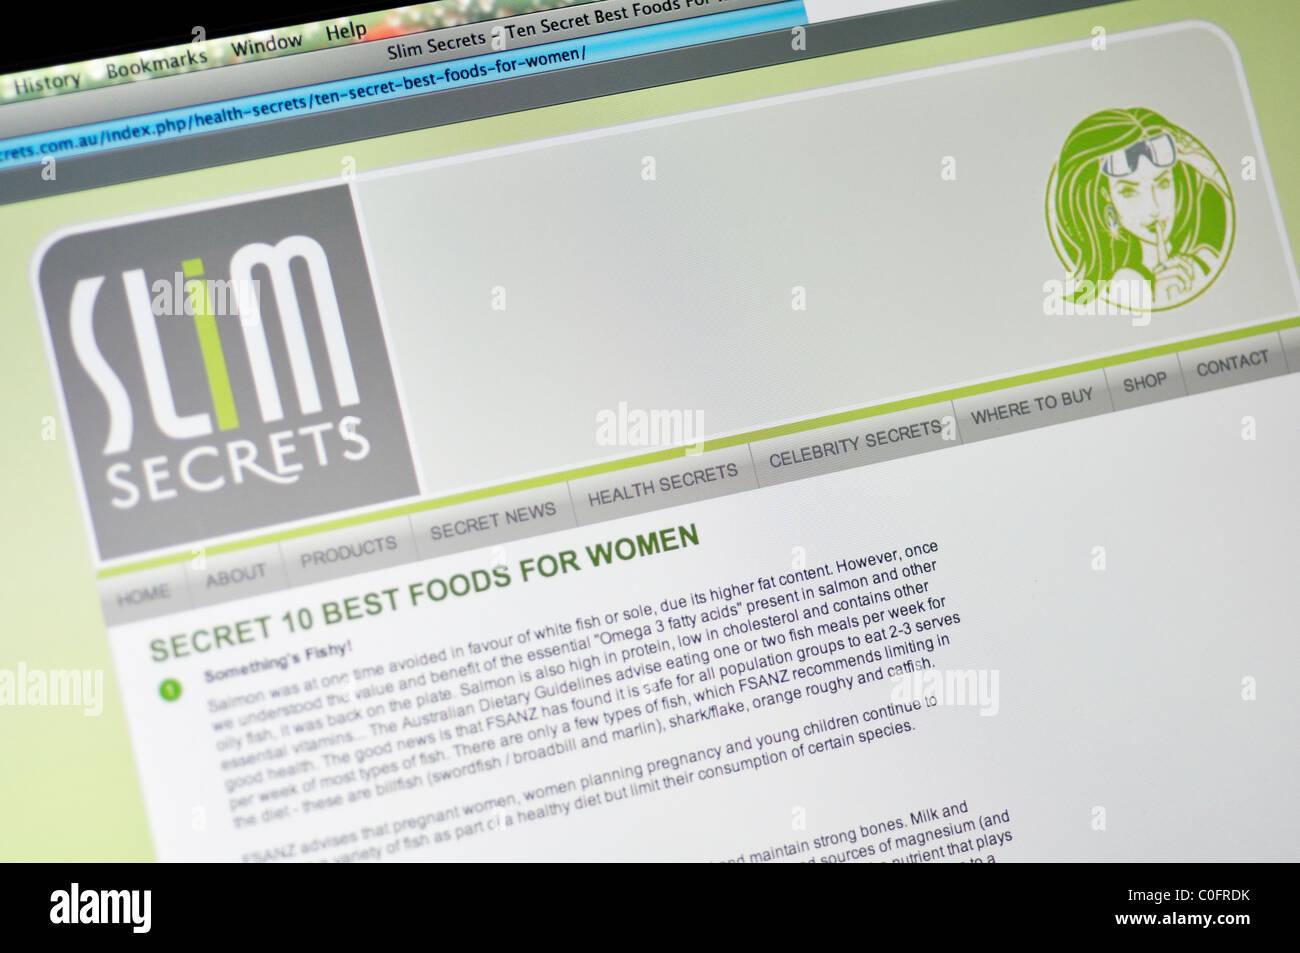 Slim Secrets website - Stock Image